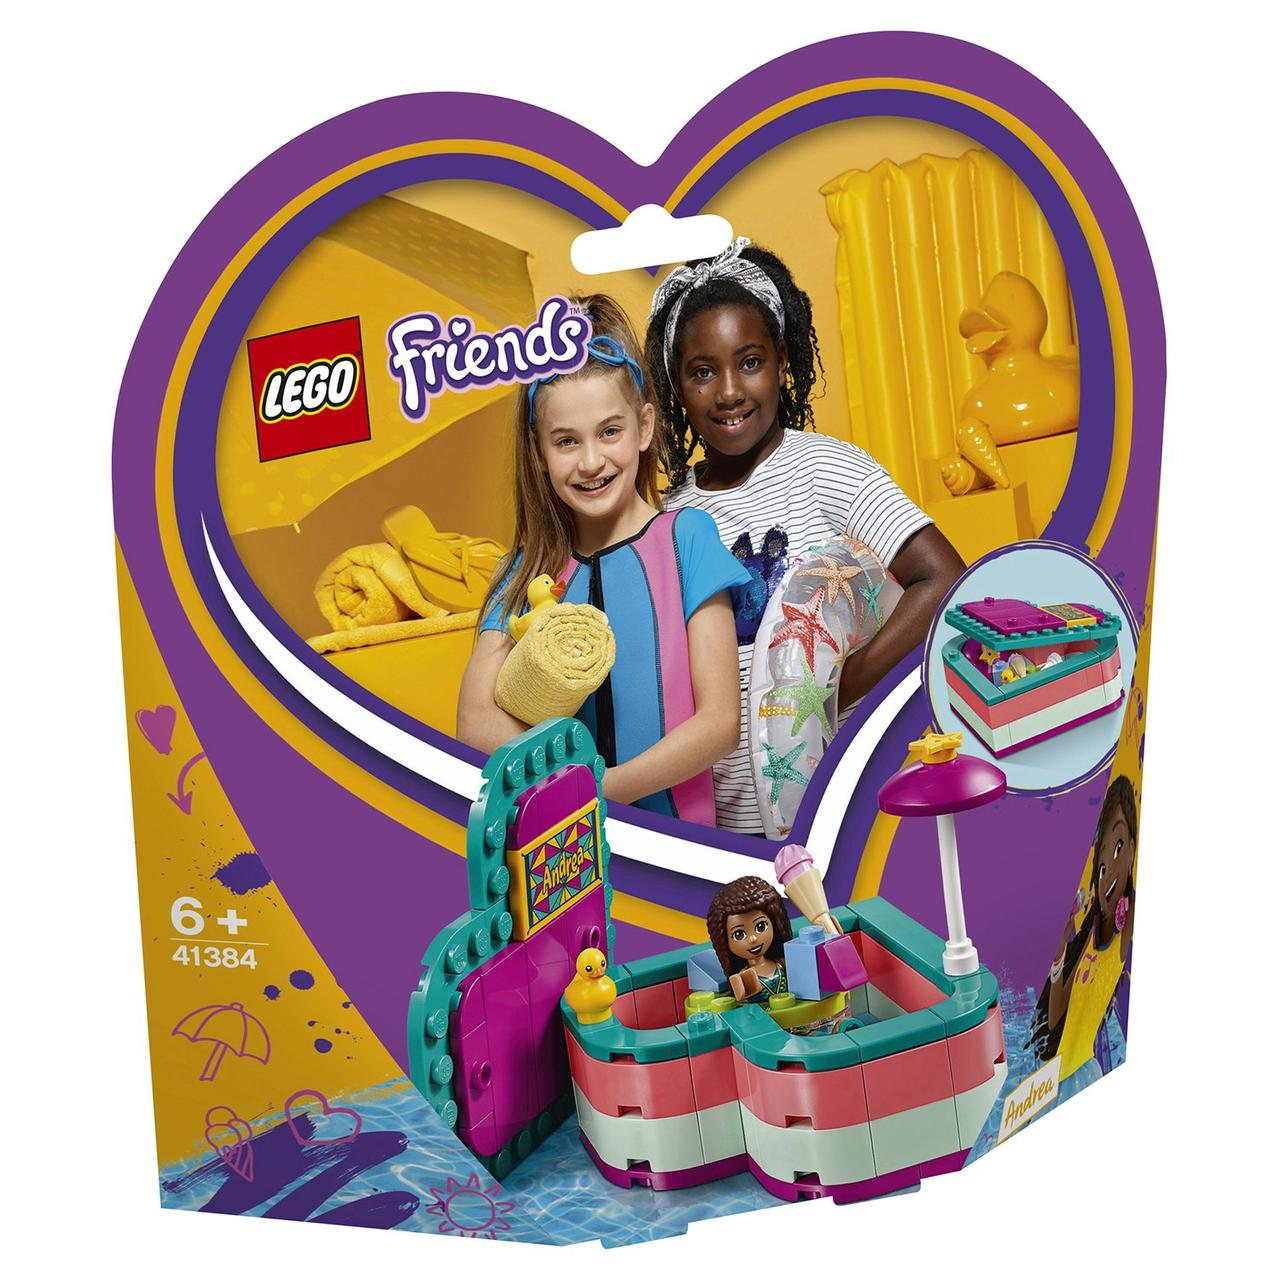 41384 Lego Friends Летняя шкатулка-сердечко для Андреа, Лего Подружки